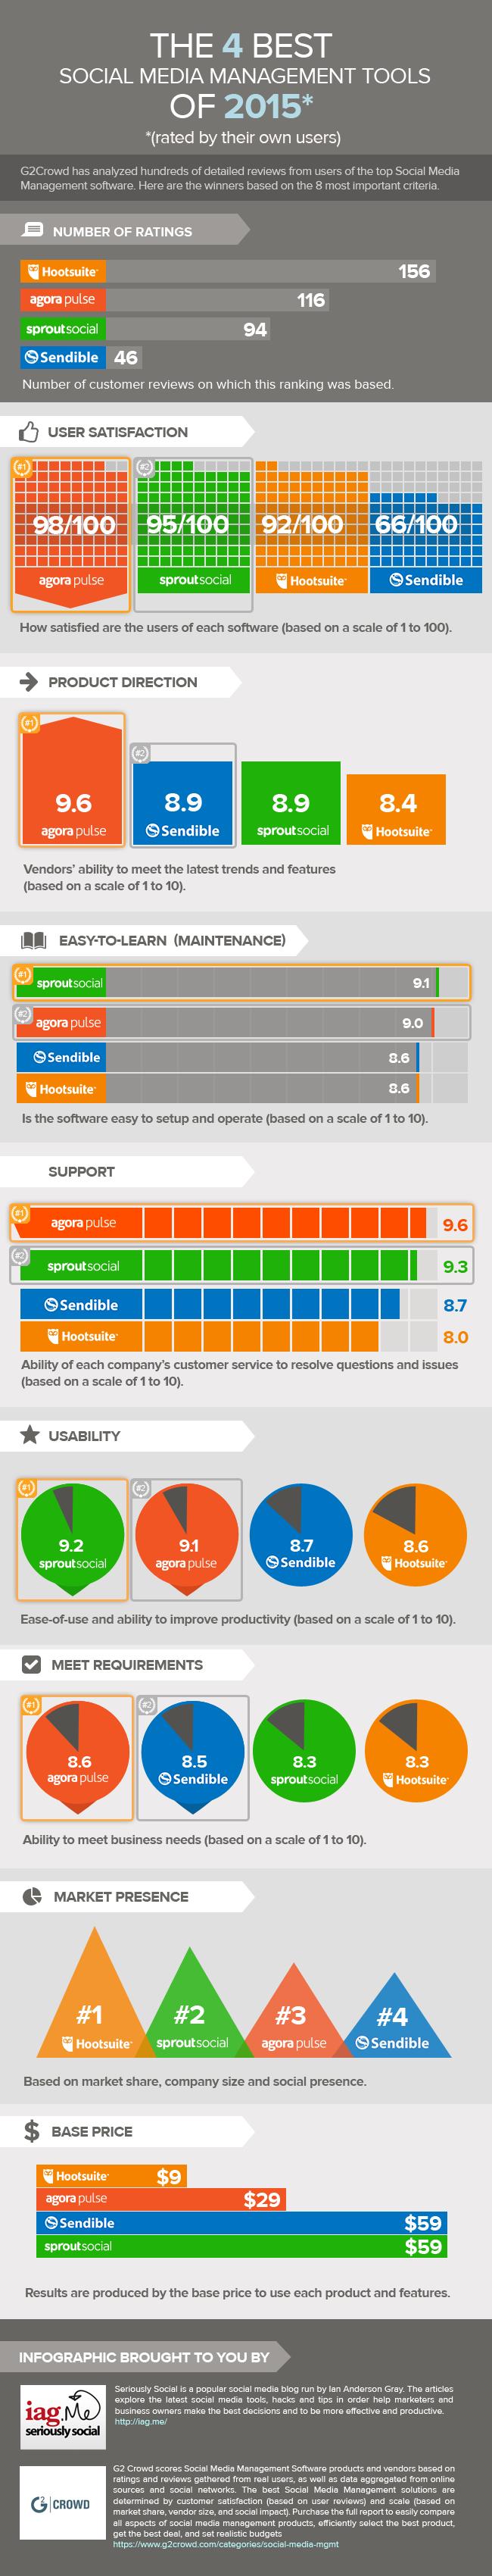 Infographic-g2crowd-iag